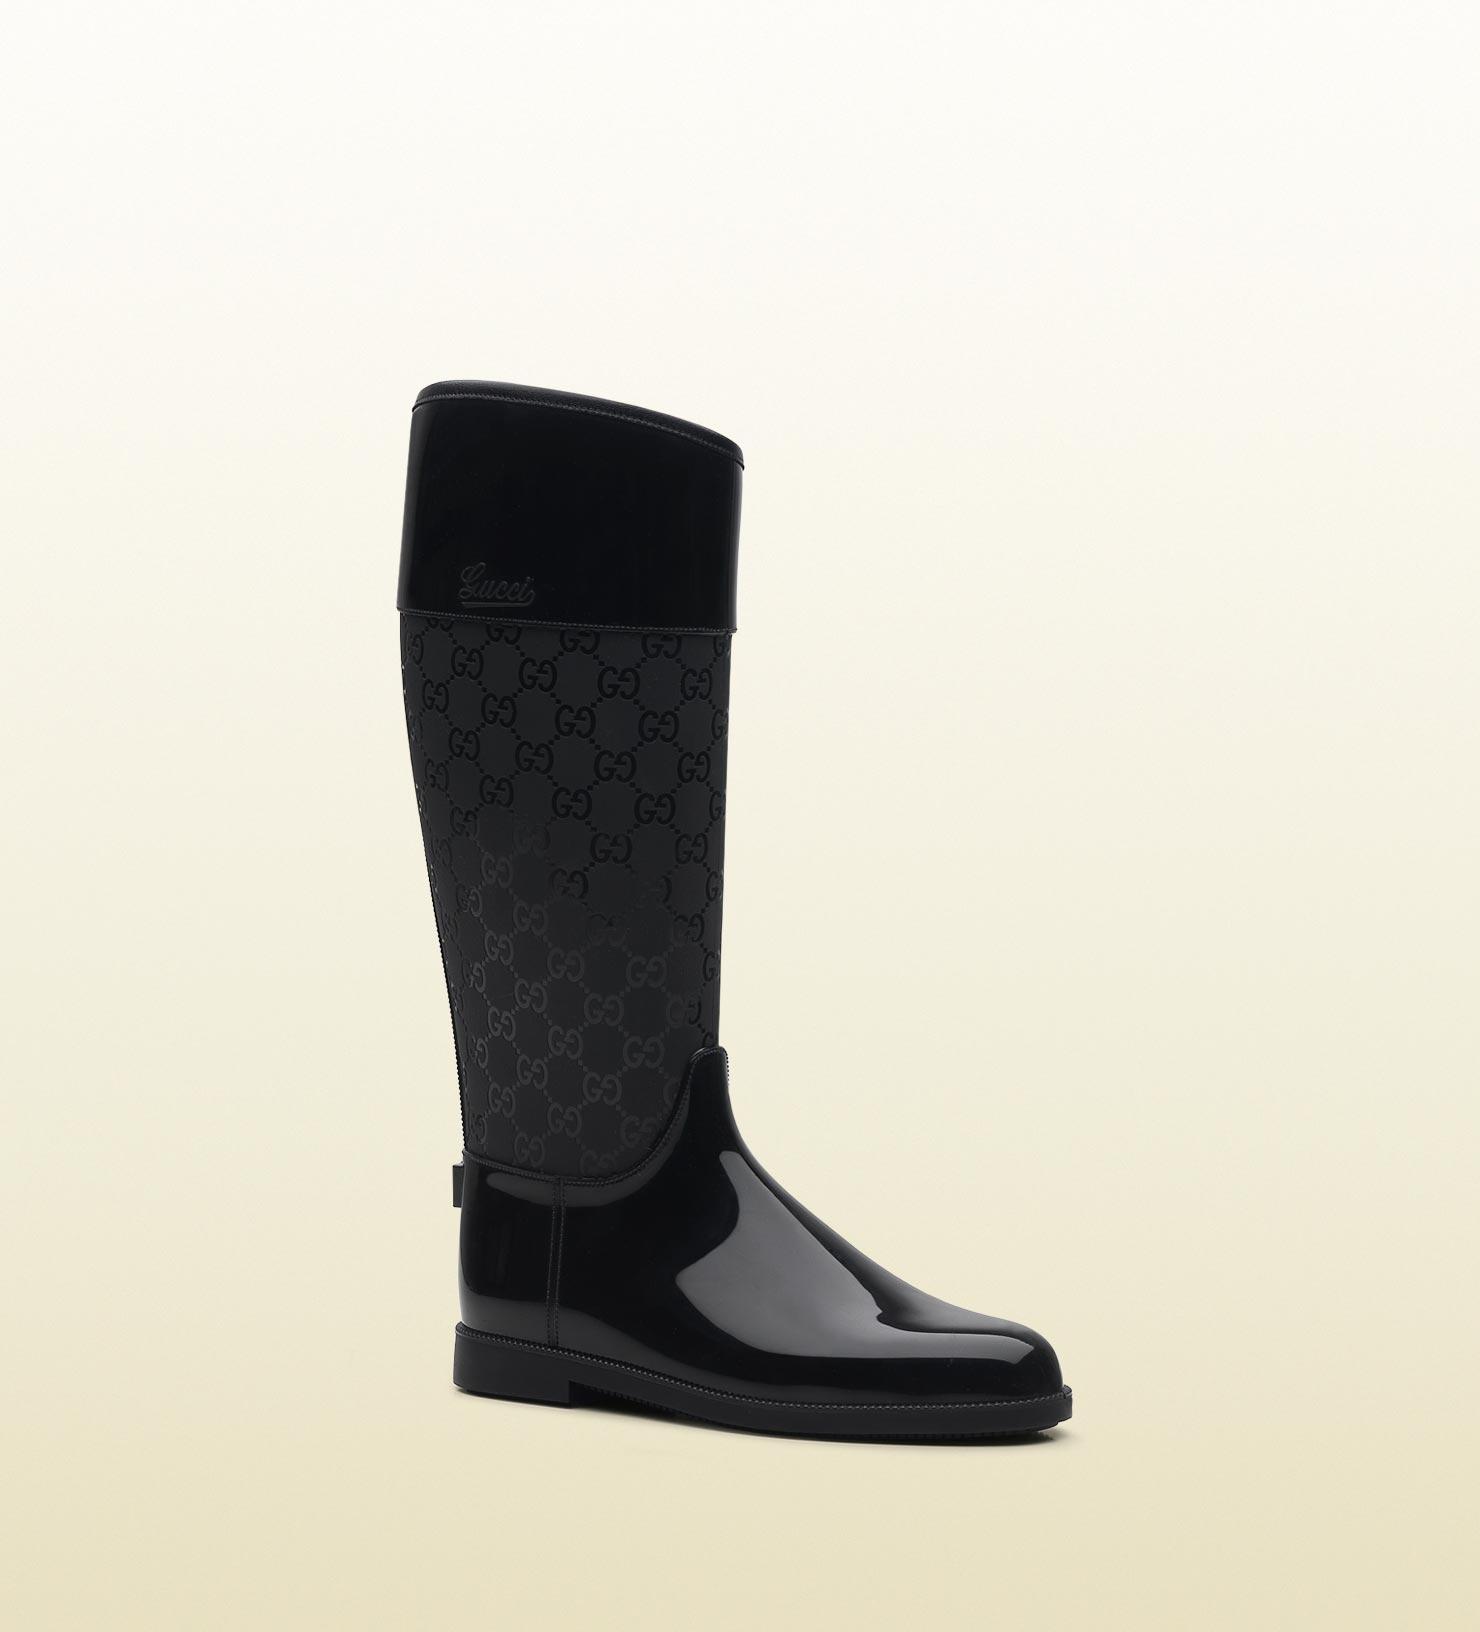 Gucci Rain Flat Boot with Gucci Script Logo in Black | Lyst